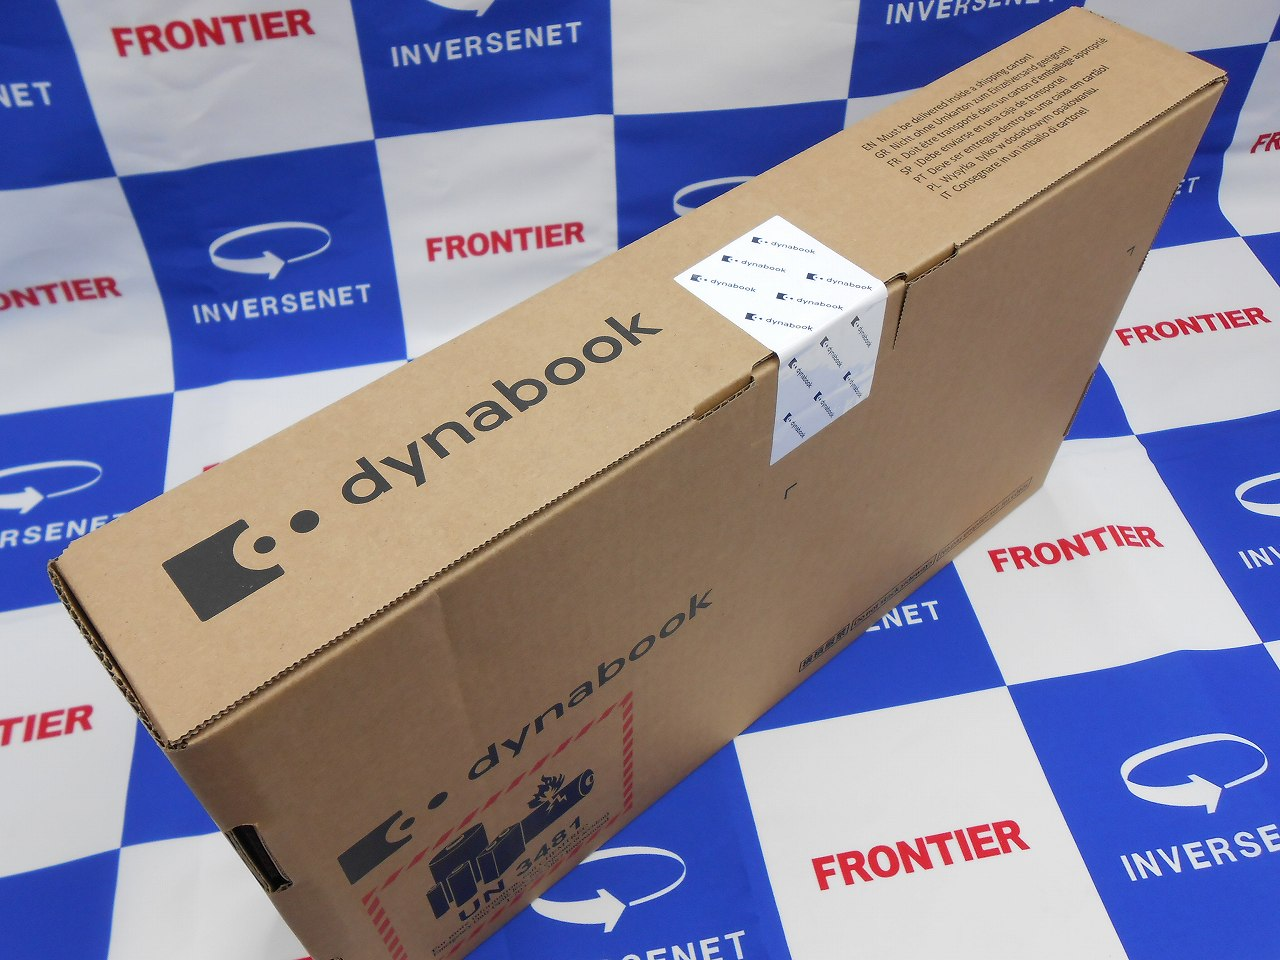 【SPRING SALE】【新品未使用品】dynabook S73/DP/2020年モデル/Corei5 8250U 1.6GHz/メモリ8GB/SSD256GB/13インチ/Windows10Pro【1年保証】【足立店発送】